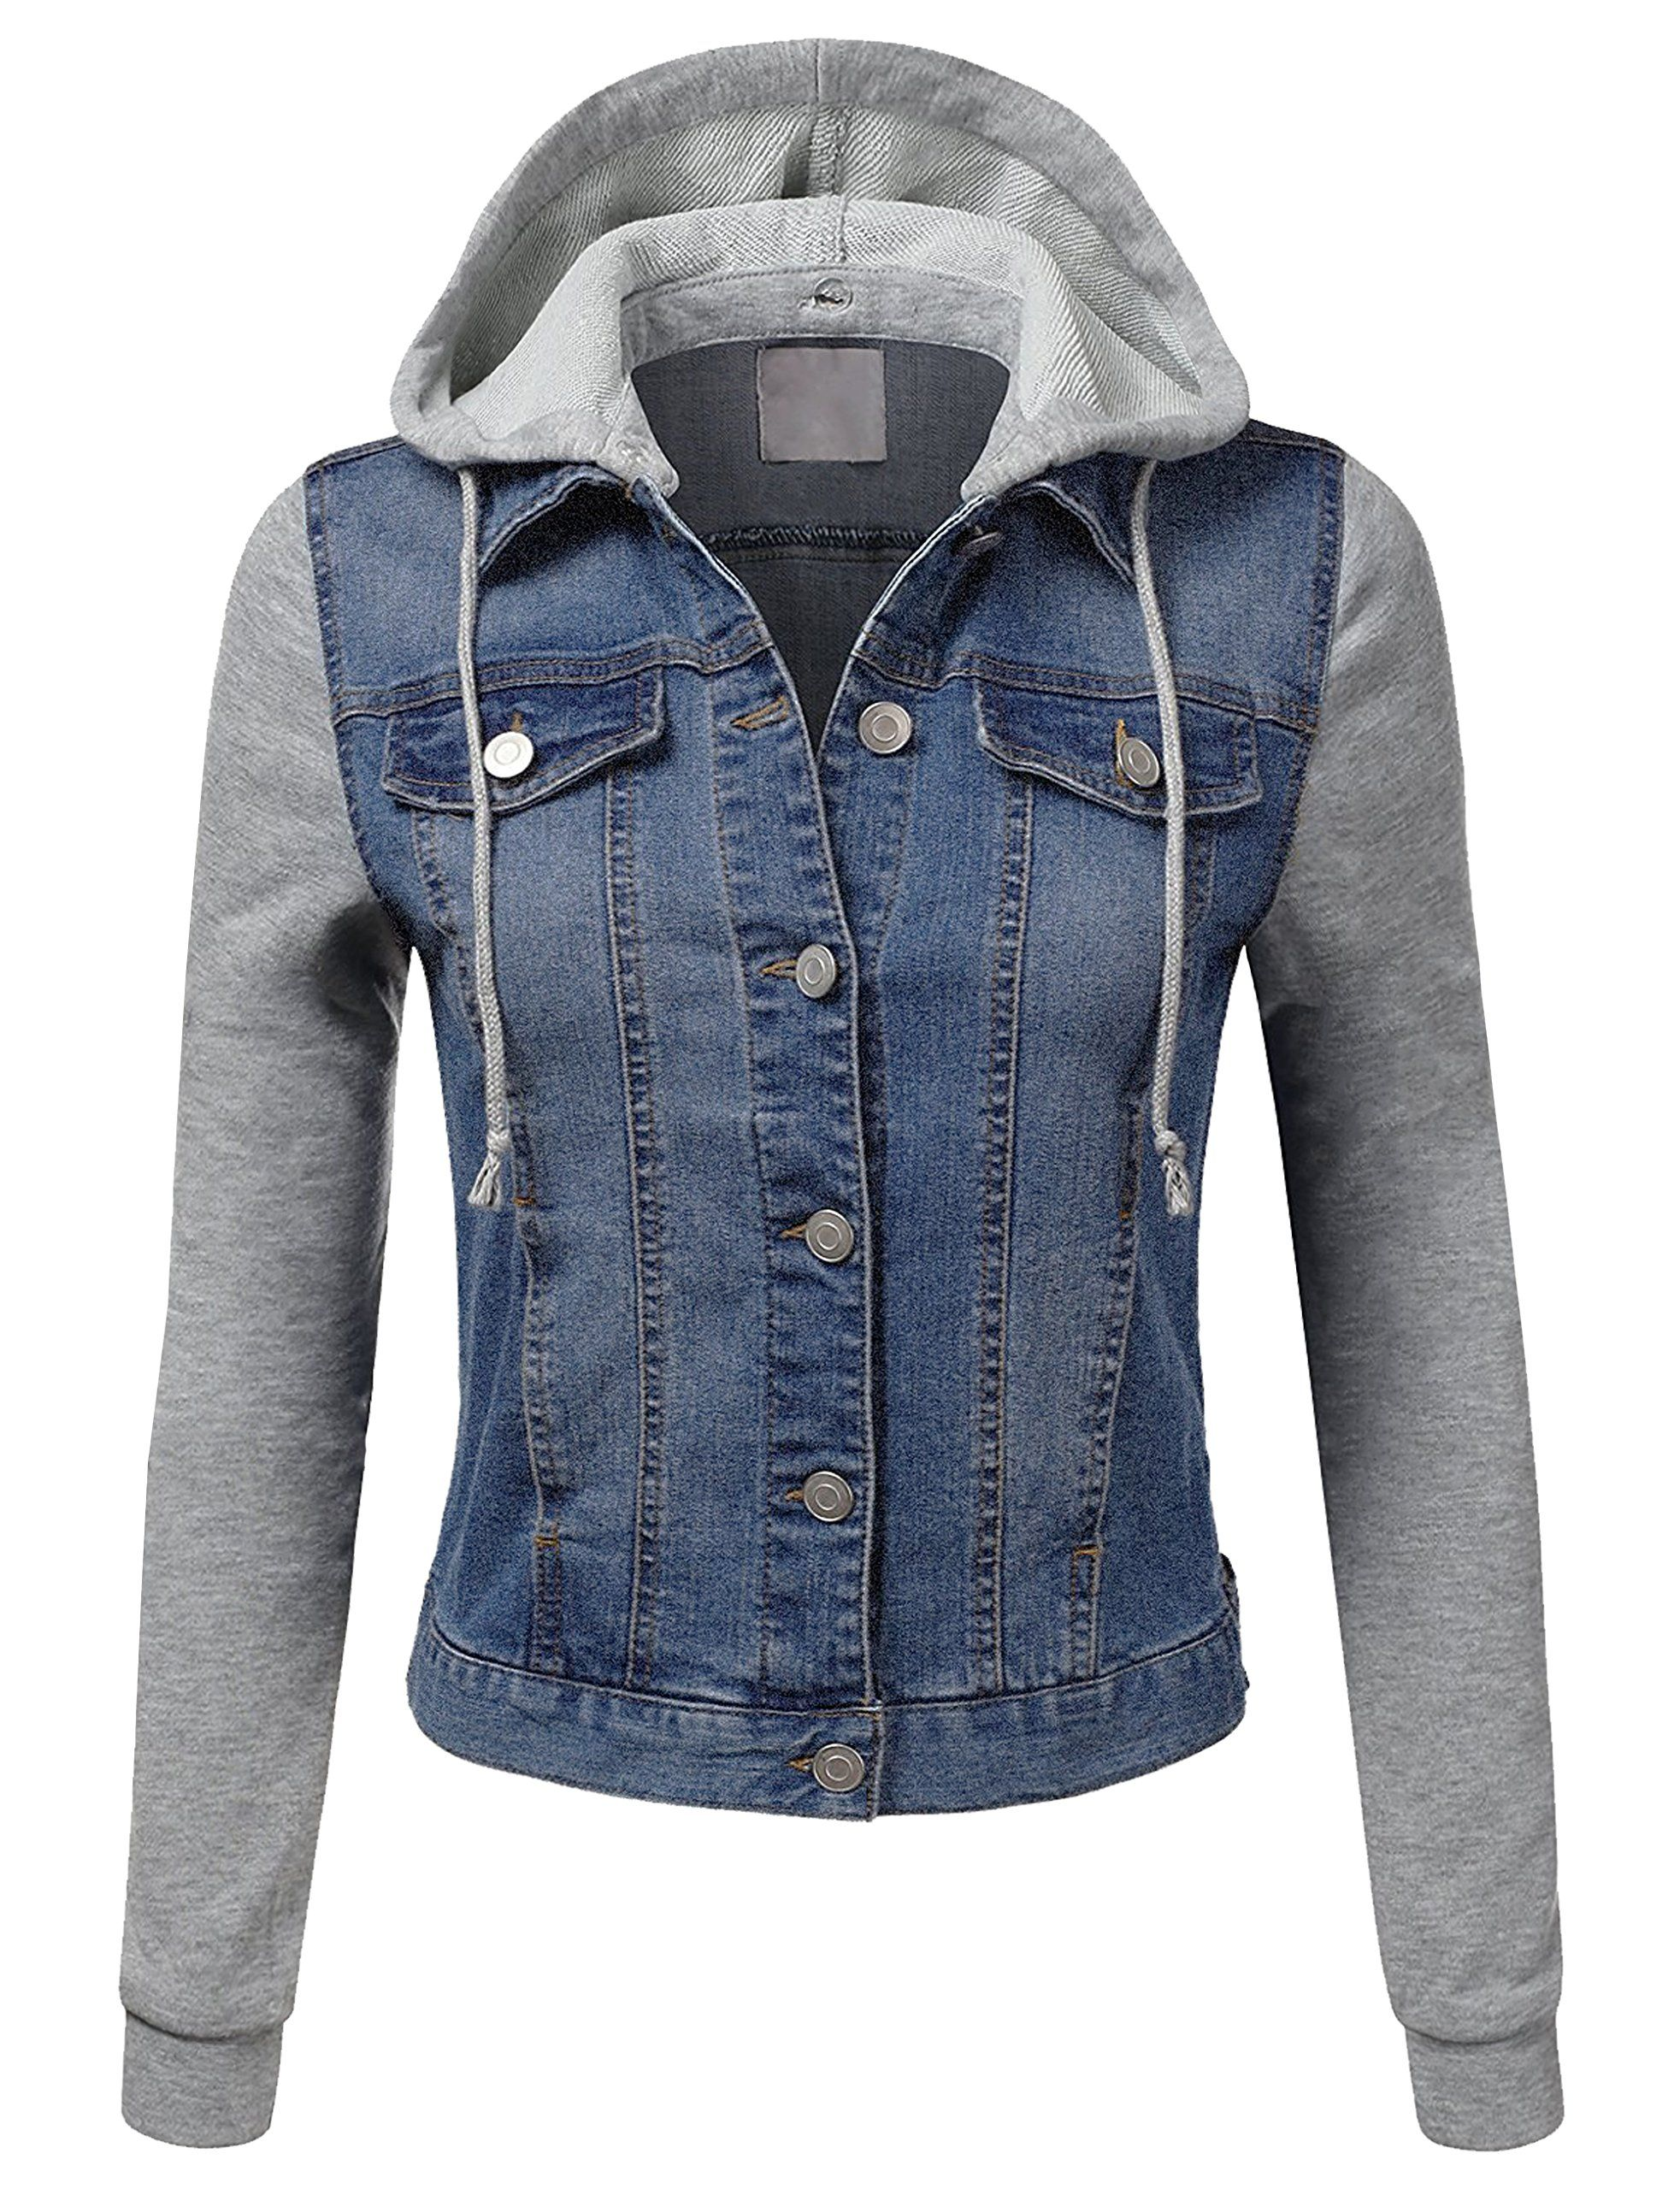 Kooldo Womens Denim Jacket Lightweight Fleece Hoodie Sleeve And Pocketslblue Details Can Be Fou Denim Jacket Women Fitted Denim Jacket Womens Jackets Casual [ 2560 x 1965 Pixel ]